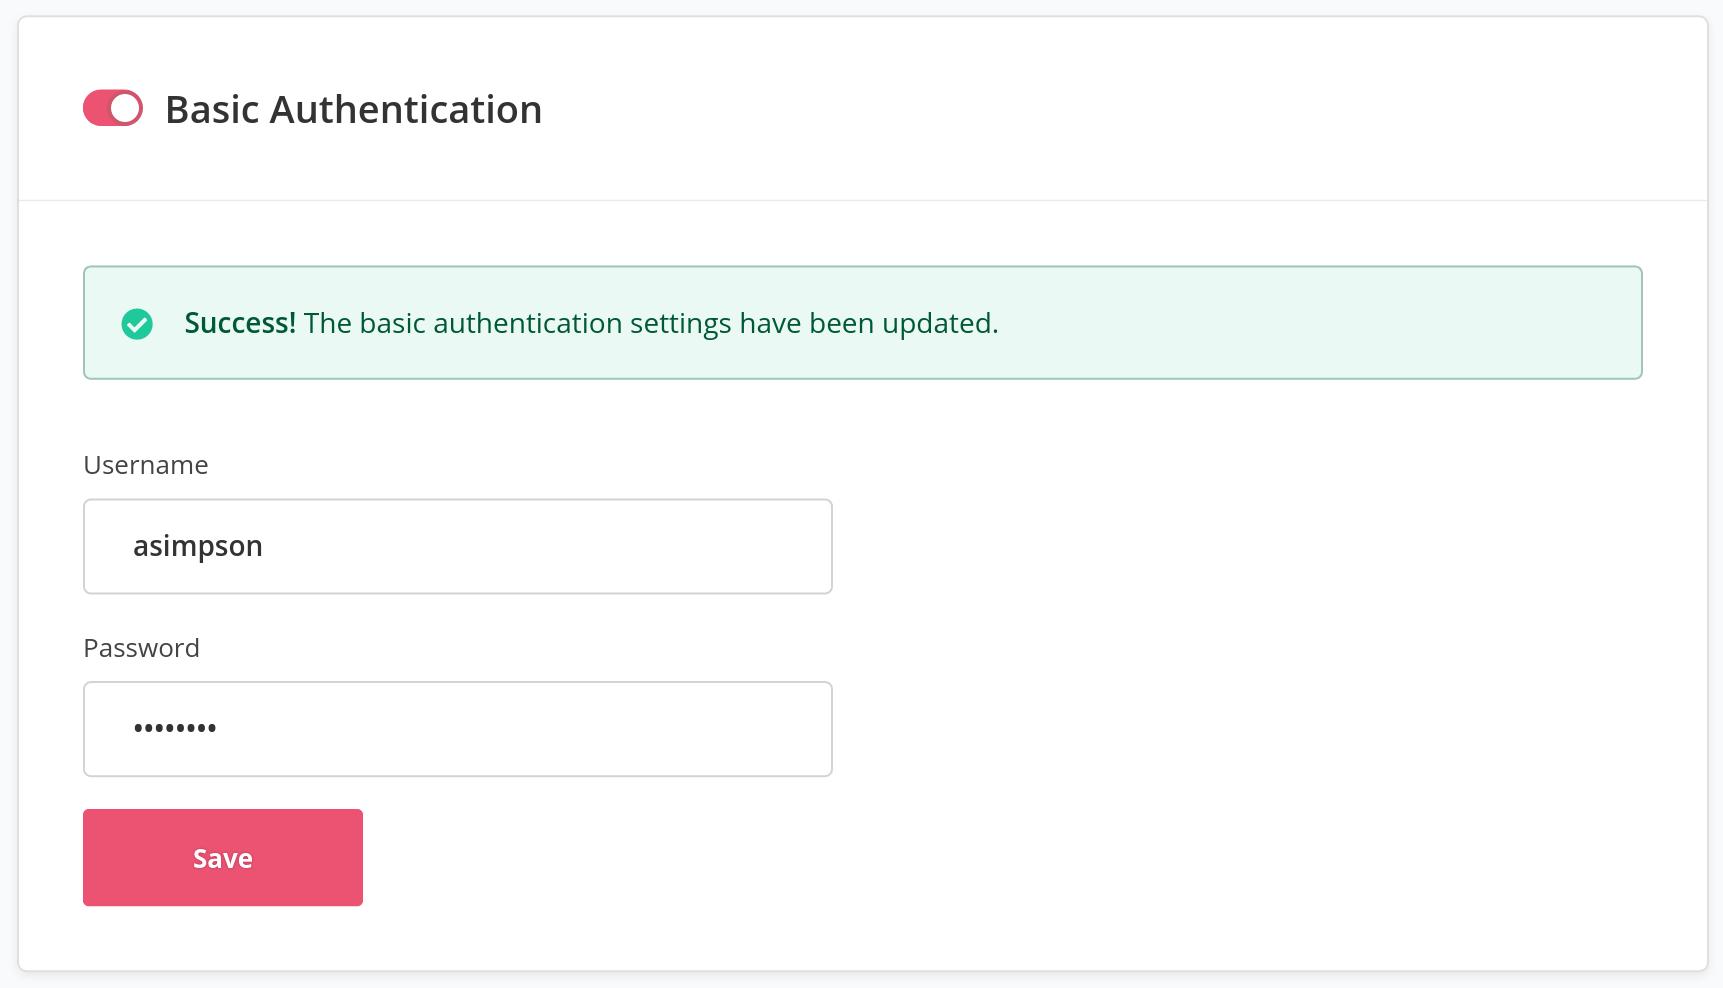 Basic Authentication Settings Saved